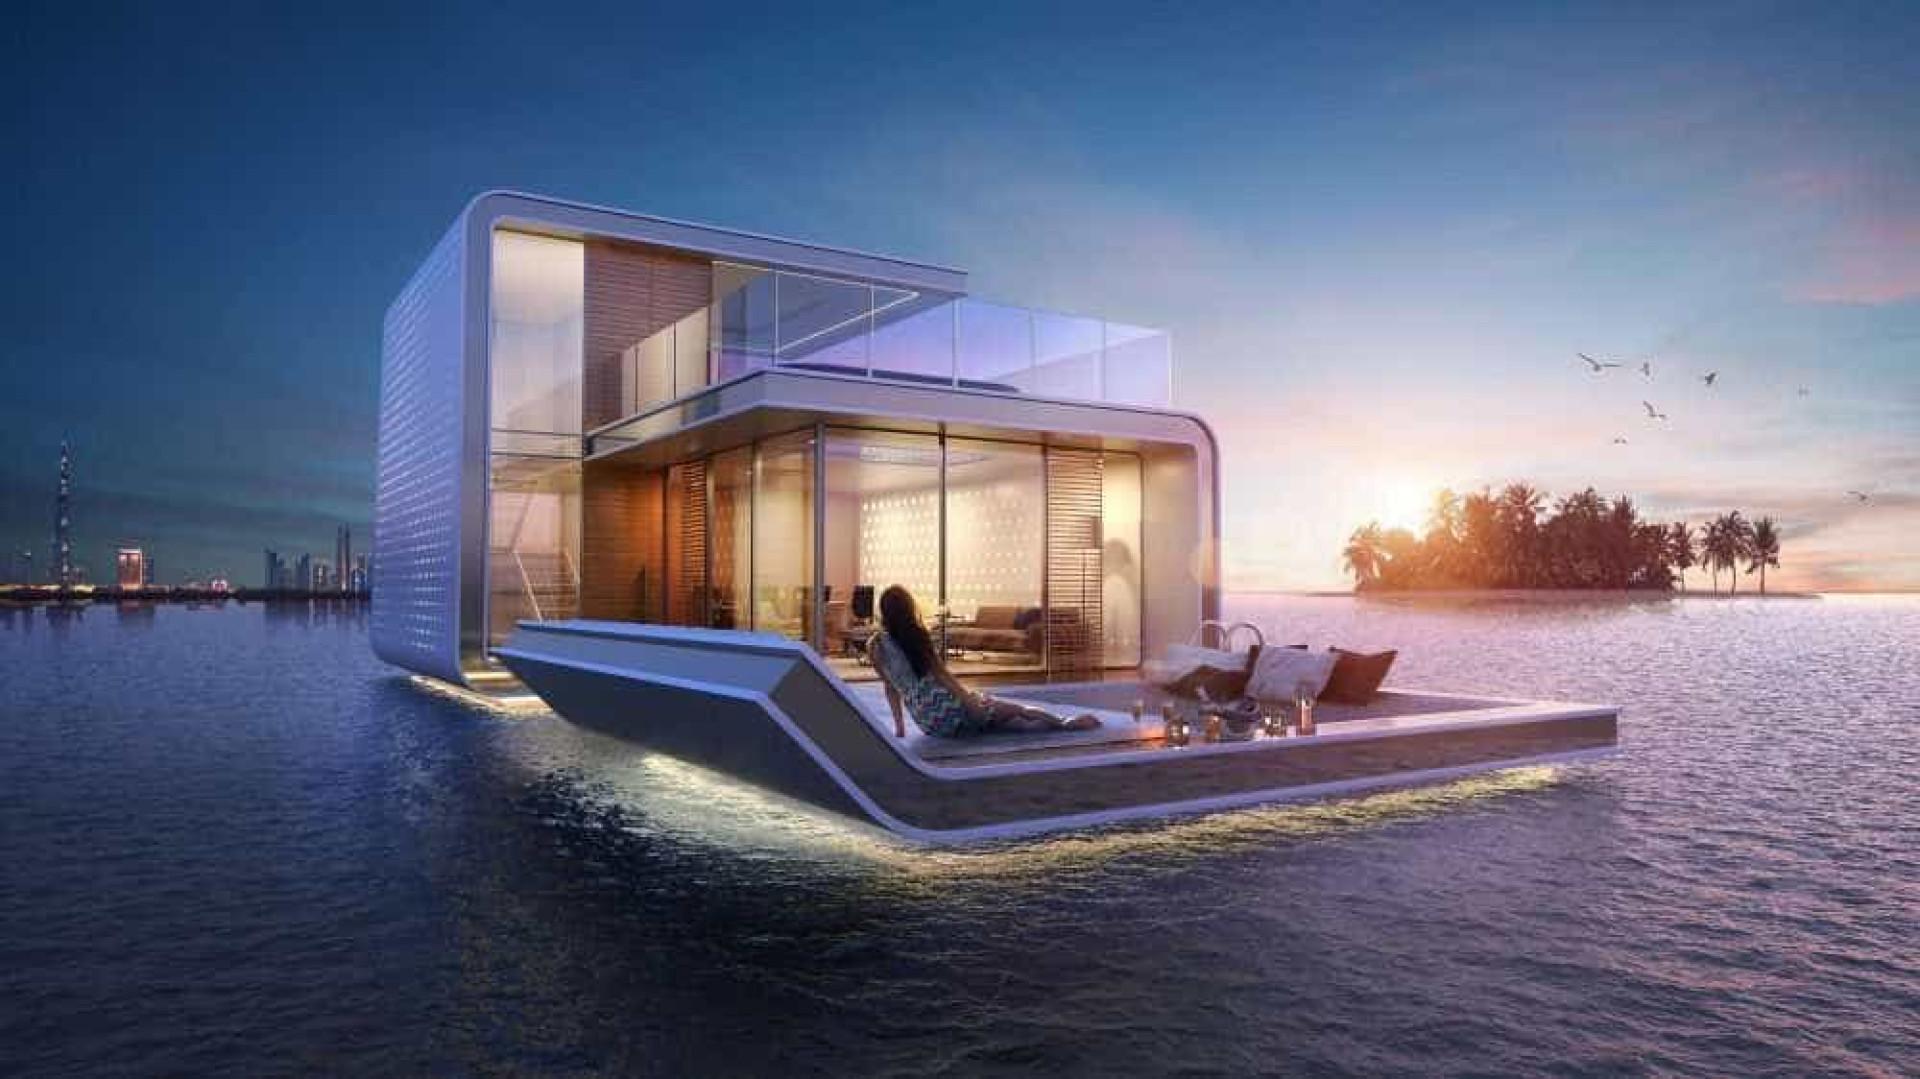 Dubai tem à venda luxuosas moradias flutuantes